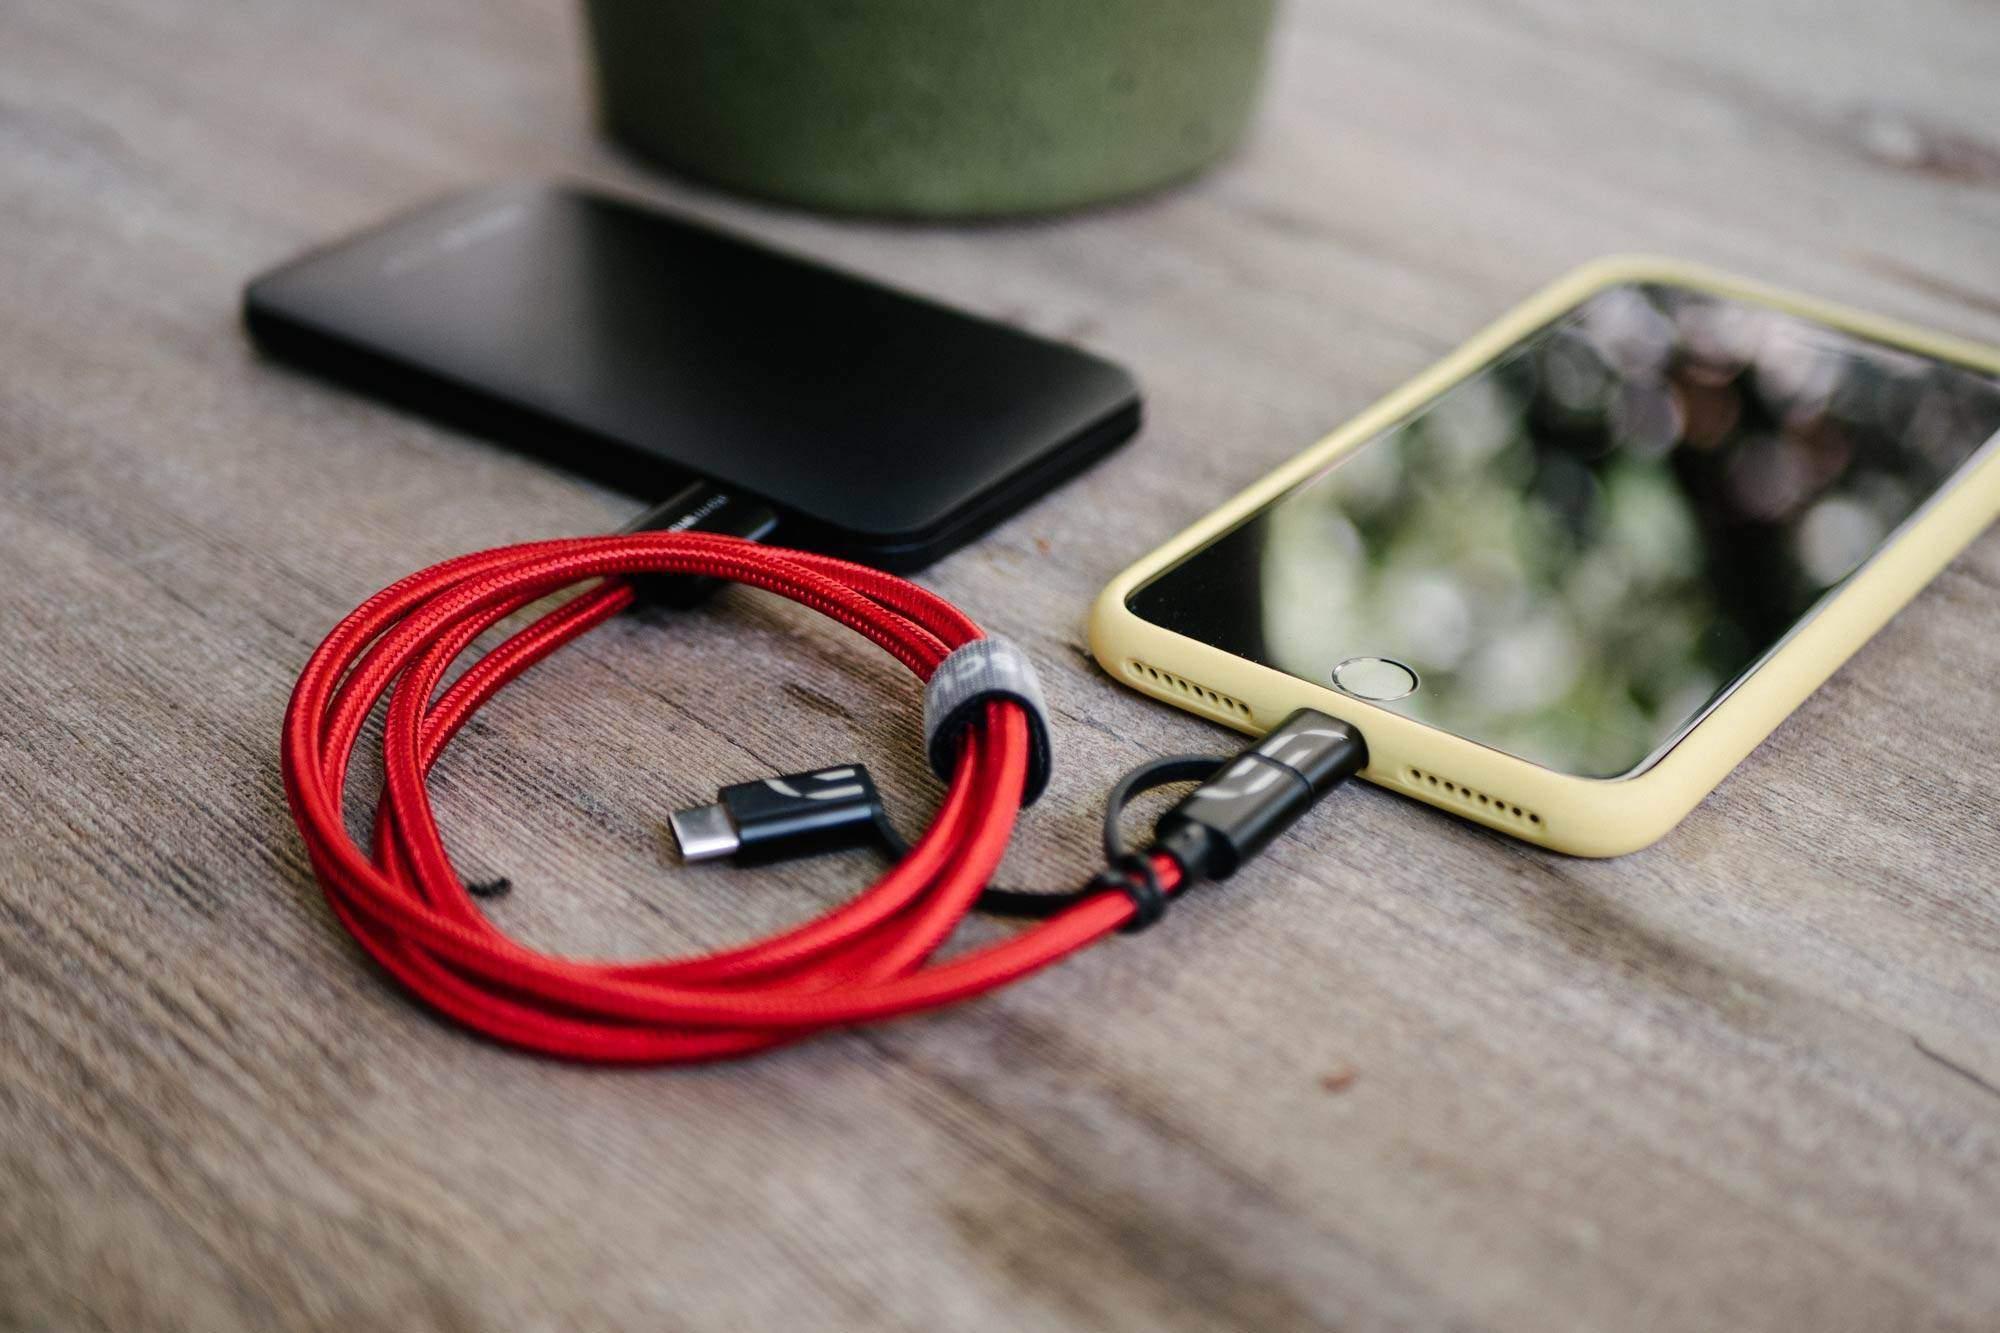 Universal USB 3 i 1 lade kabel for iPhone og Android